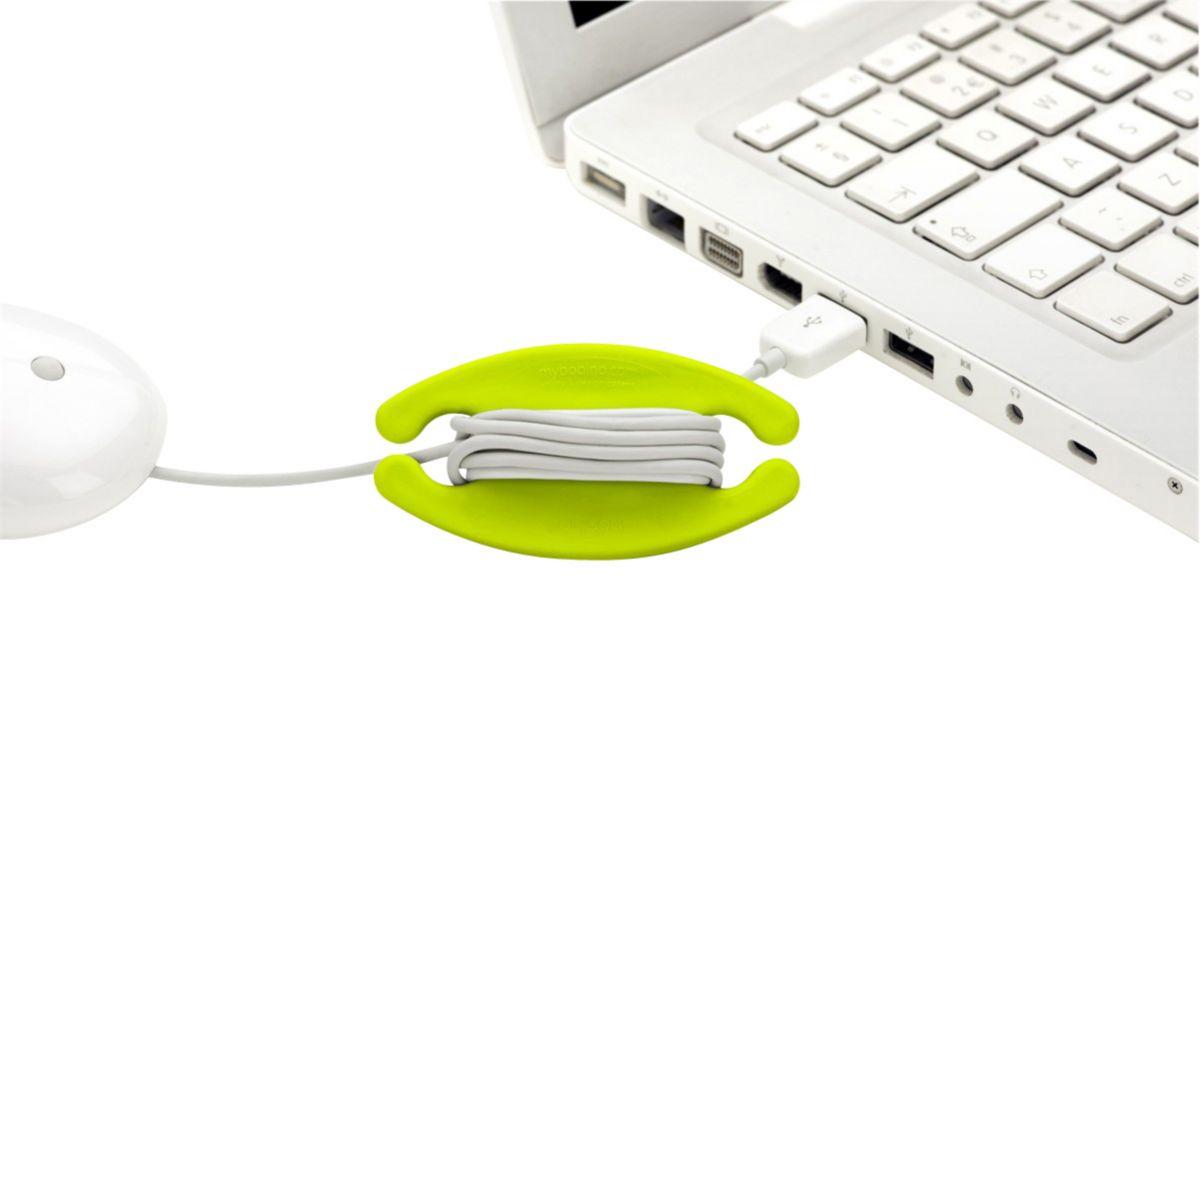 Serre-câble bobino enrouleur de cable m vert (photo)